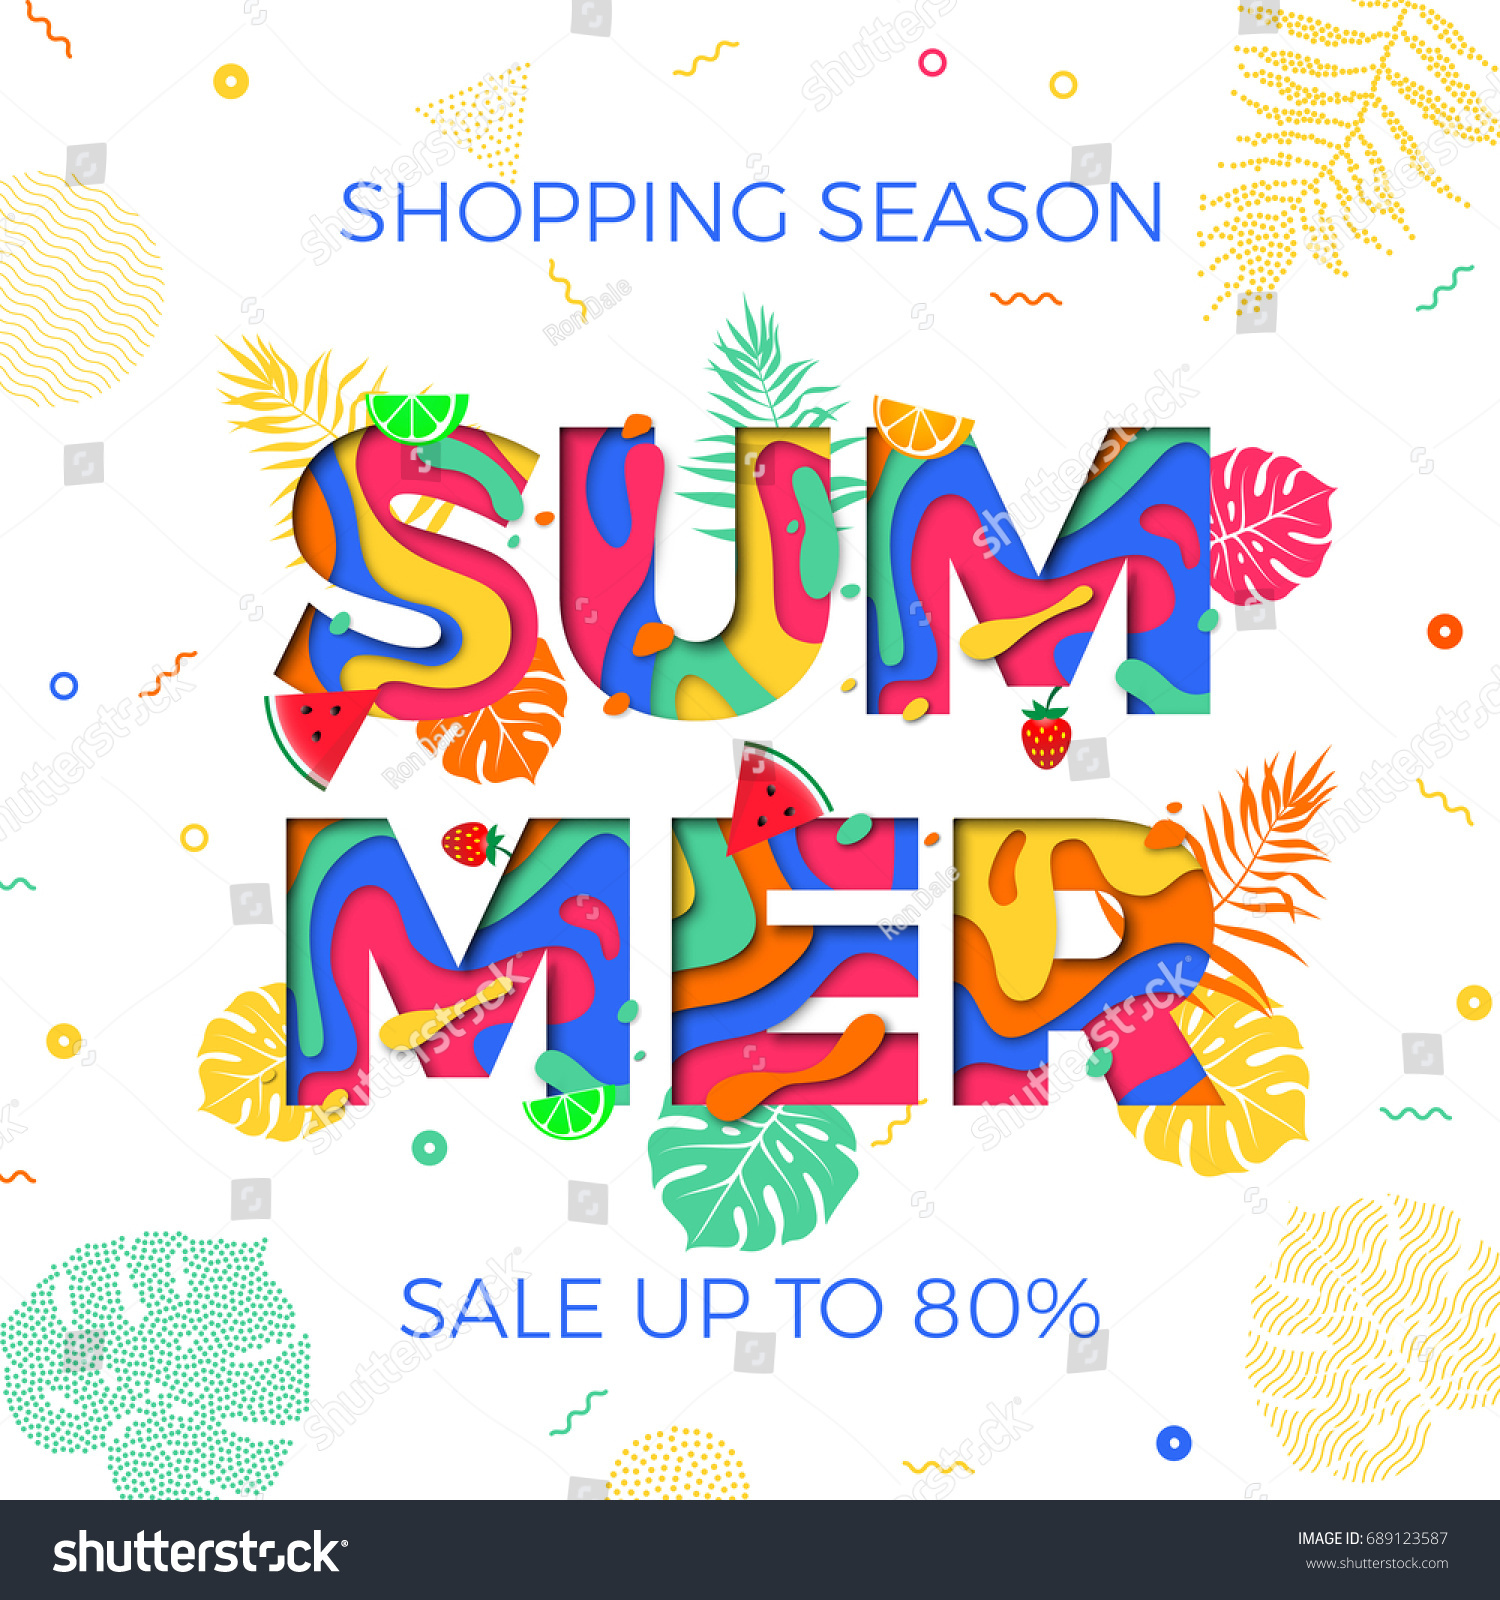 summer sale poster template online shop stock vector 689123587, Powerpoint templates